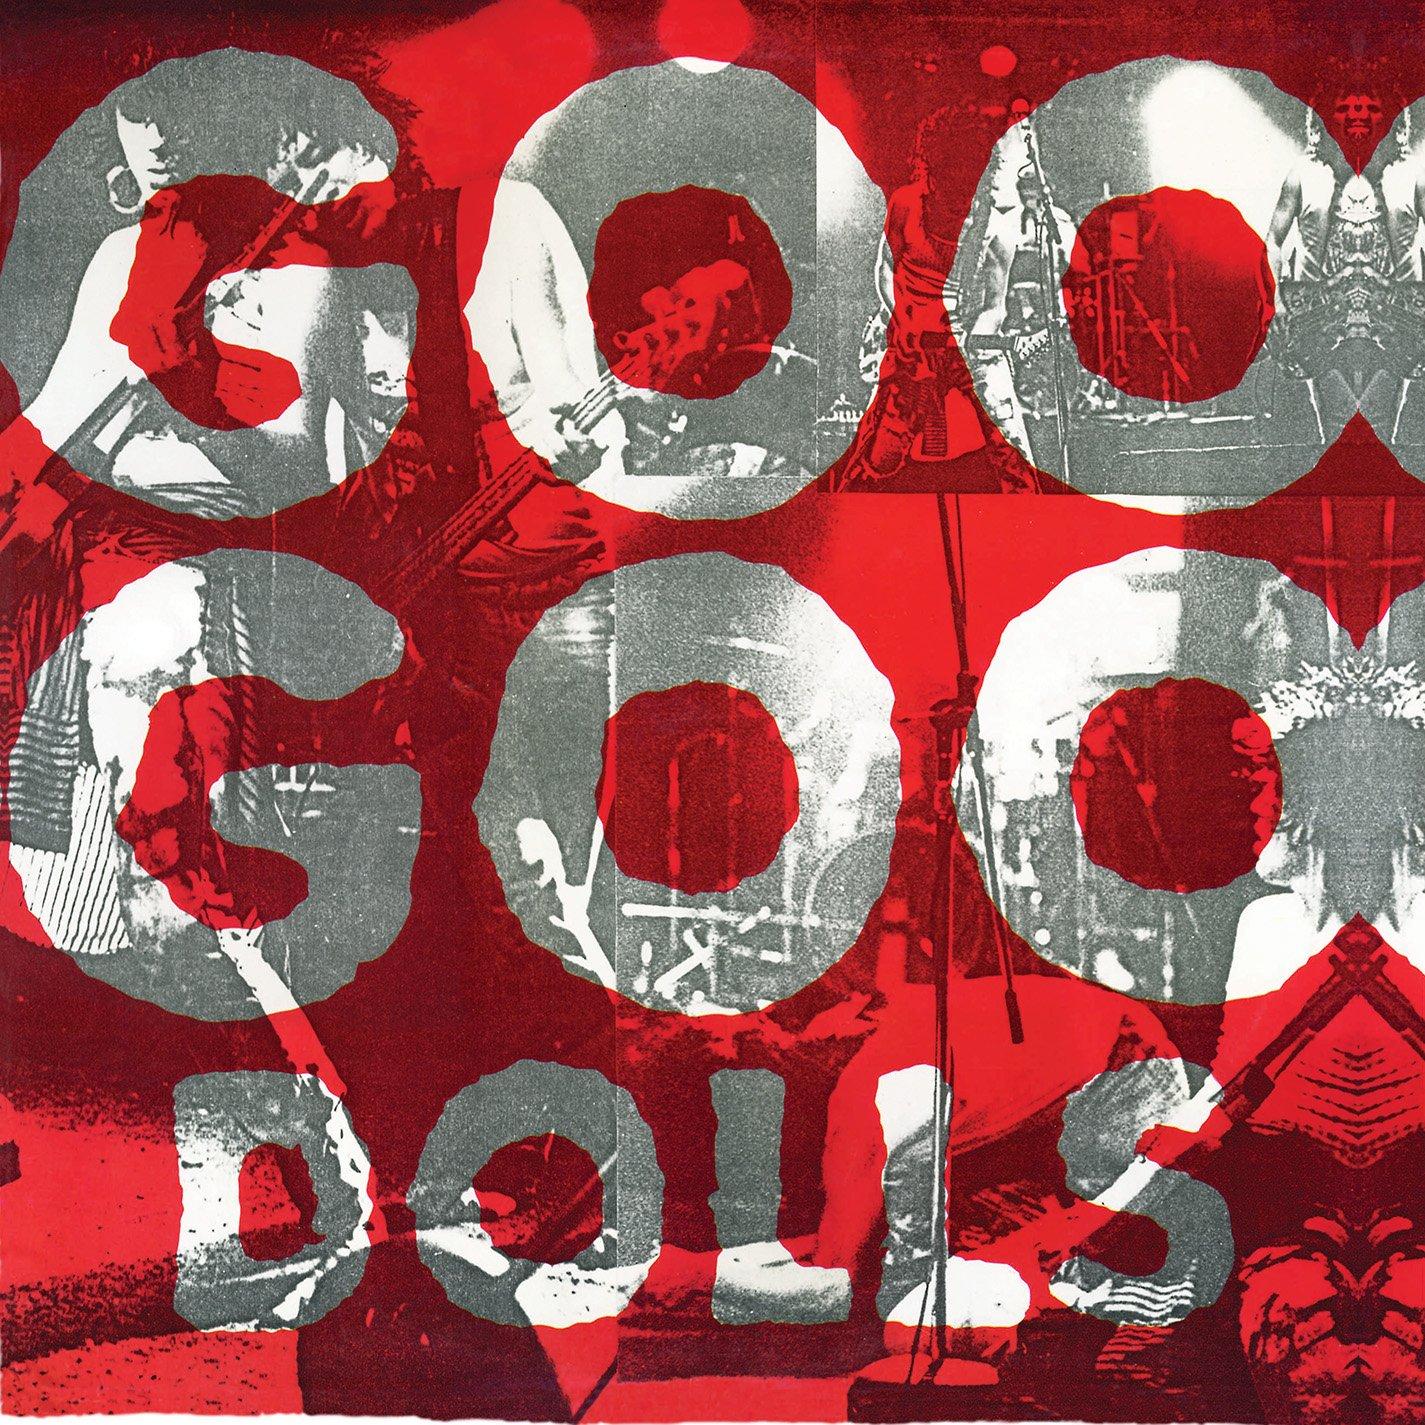 Goo Goo Dolls - Goo Goo Dolls (1987) [FLAC] Download